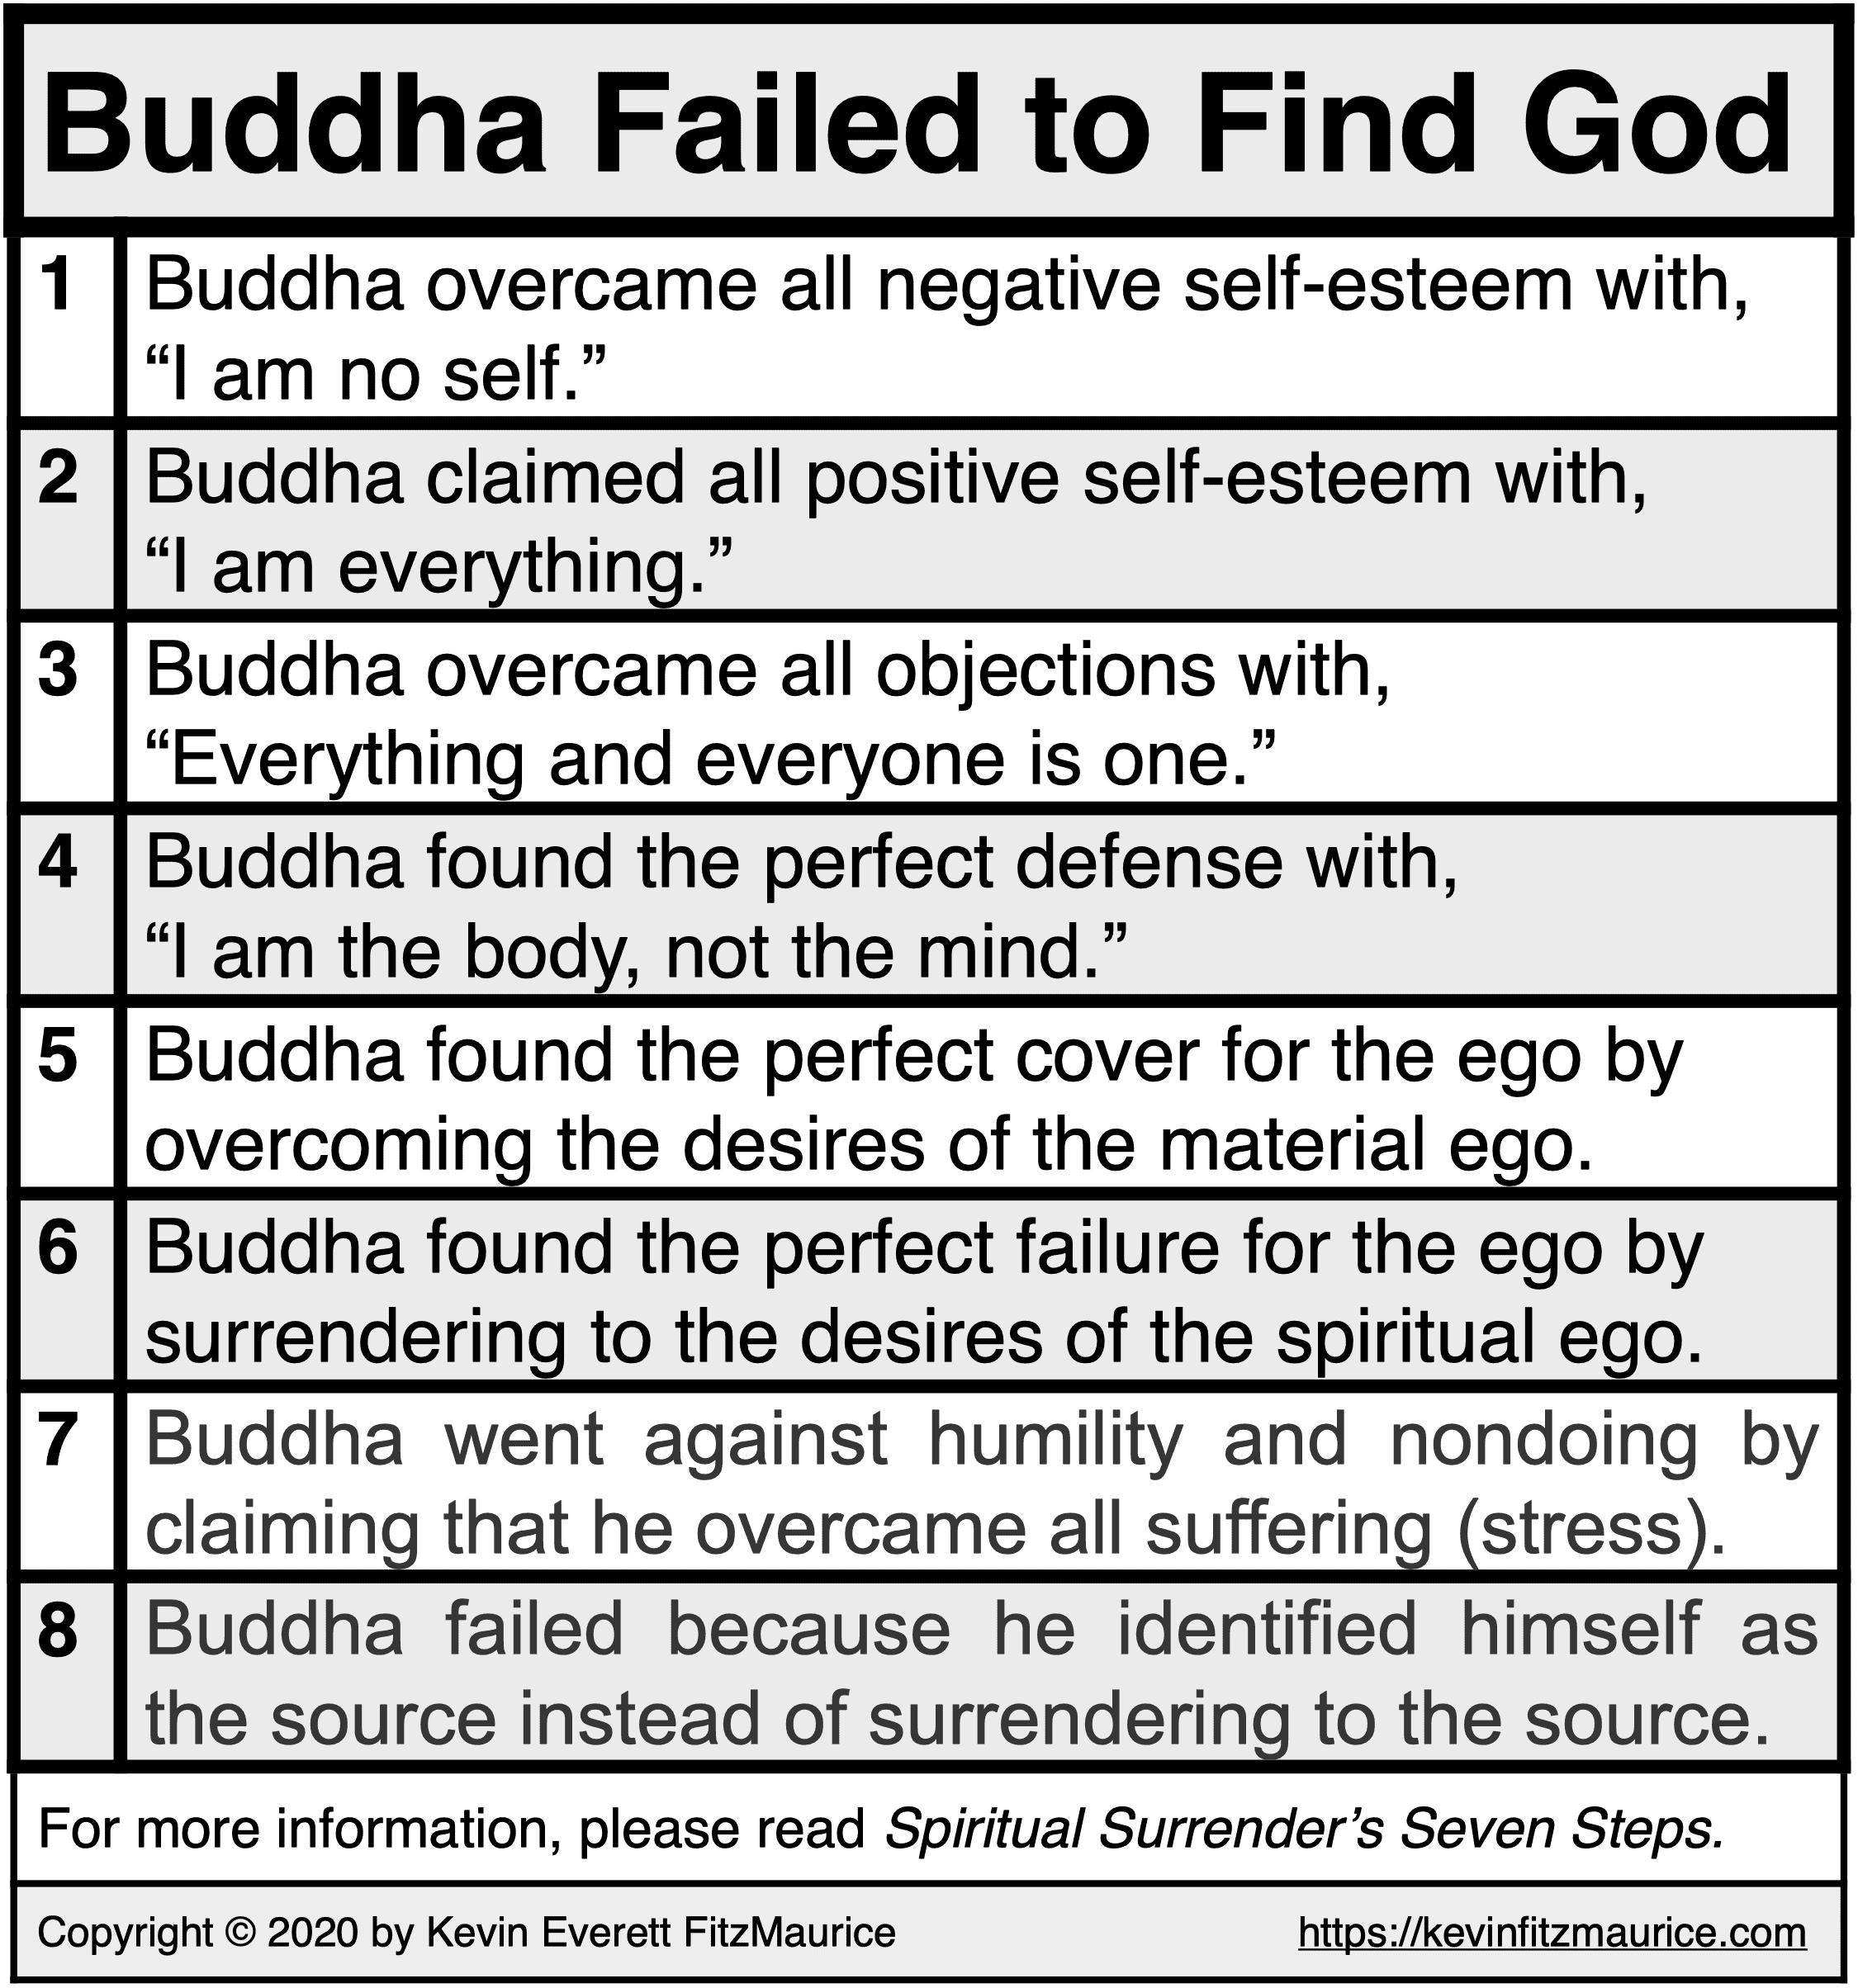 Buddha Failed to Find God